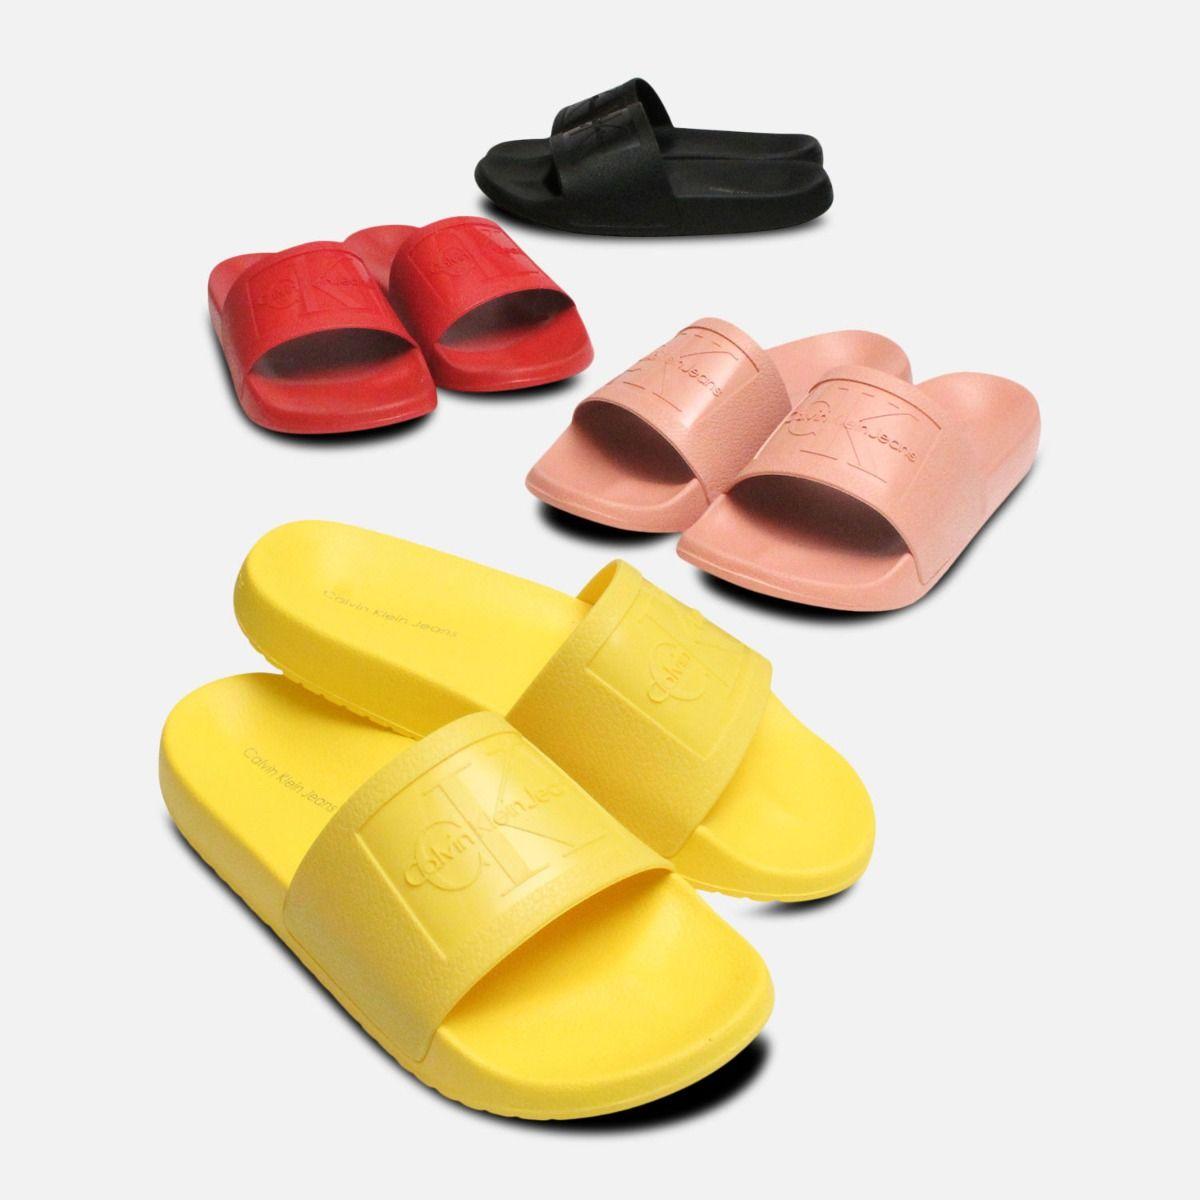 Black Jelly Calvin Klein Sandals Christie Pool Slides